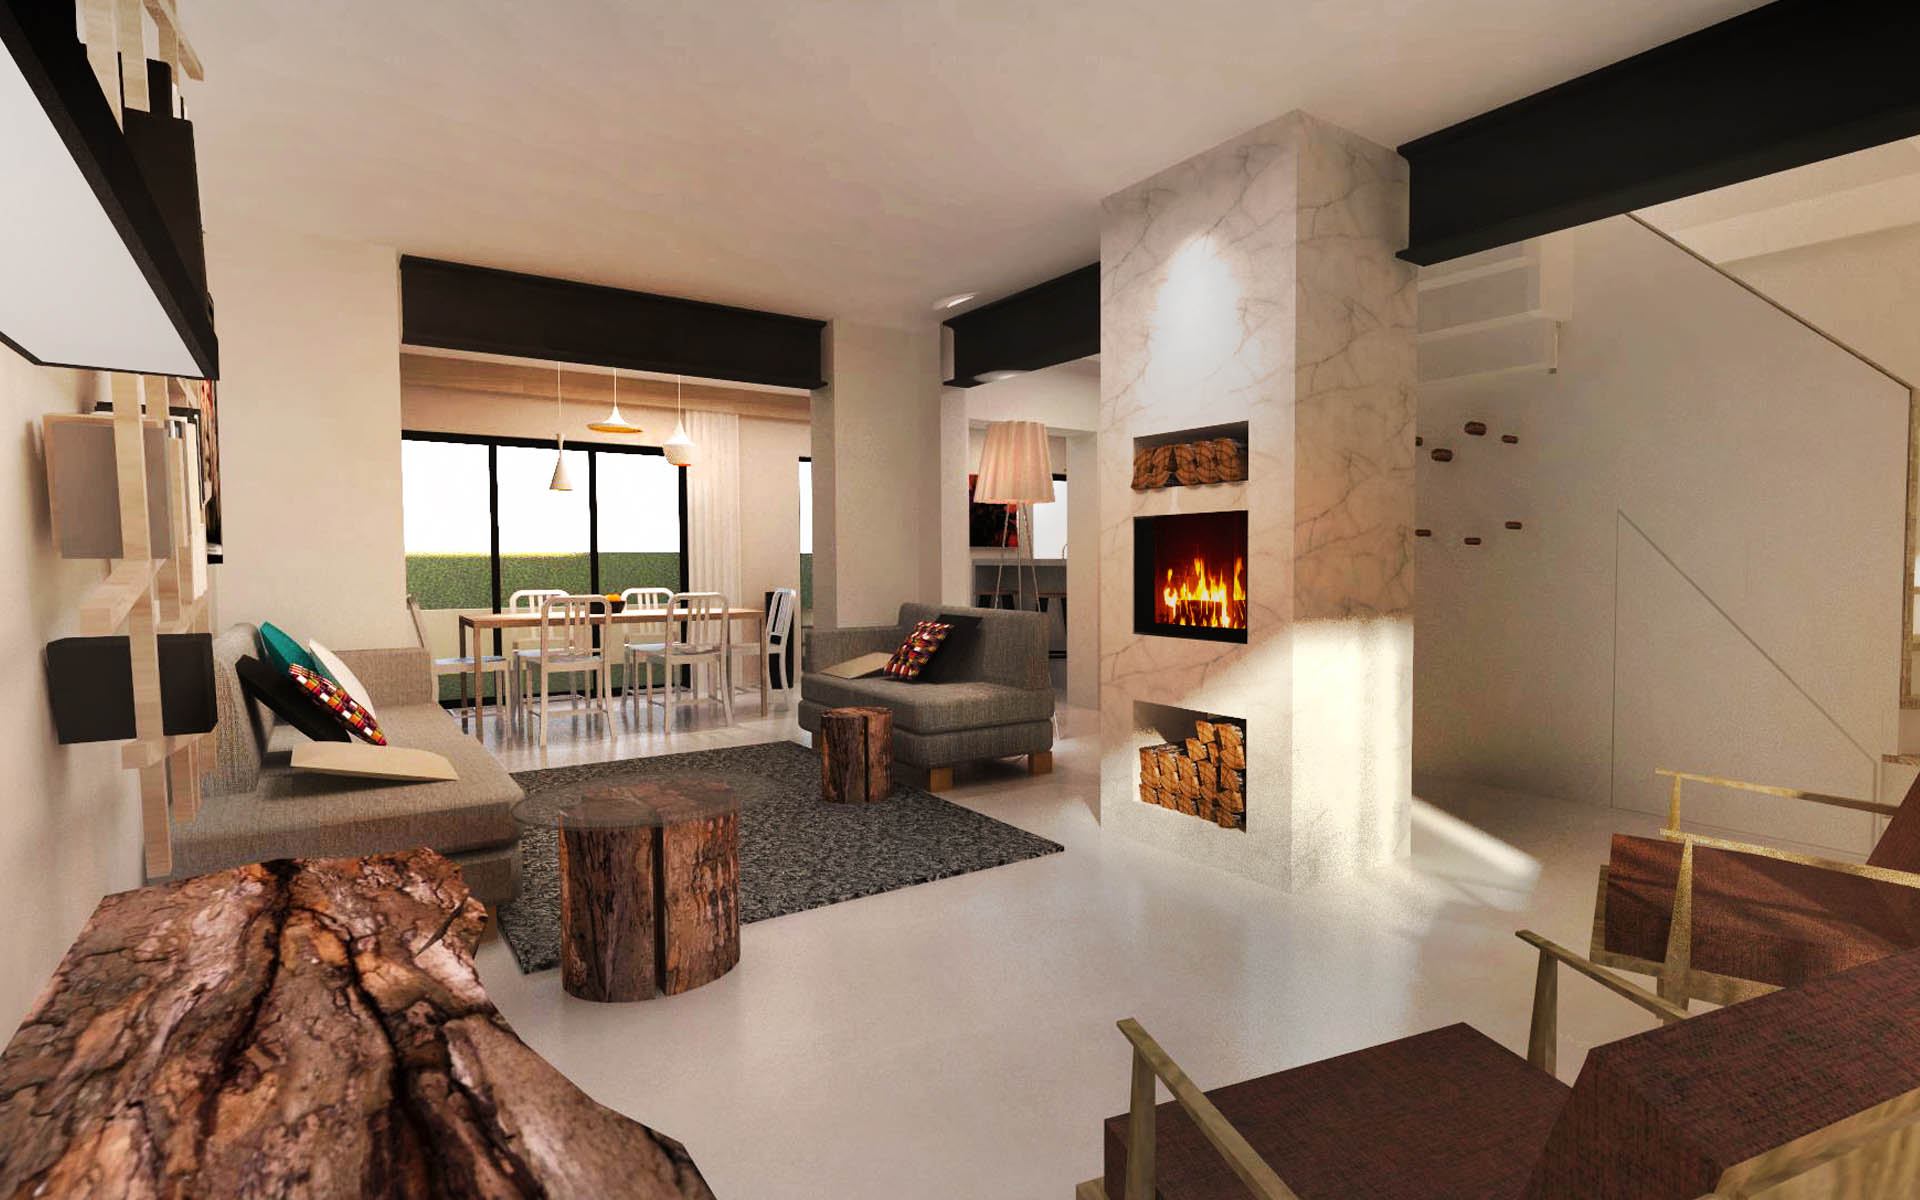 architecture int rieure red banana architecte d 39 int rieur aix. Black Bedroom Furniture Sets. Home Design Ideas